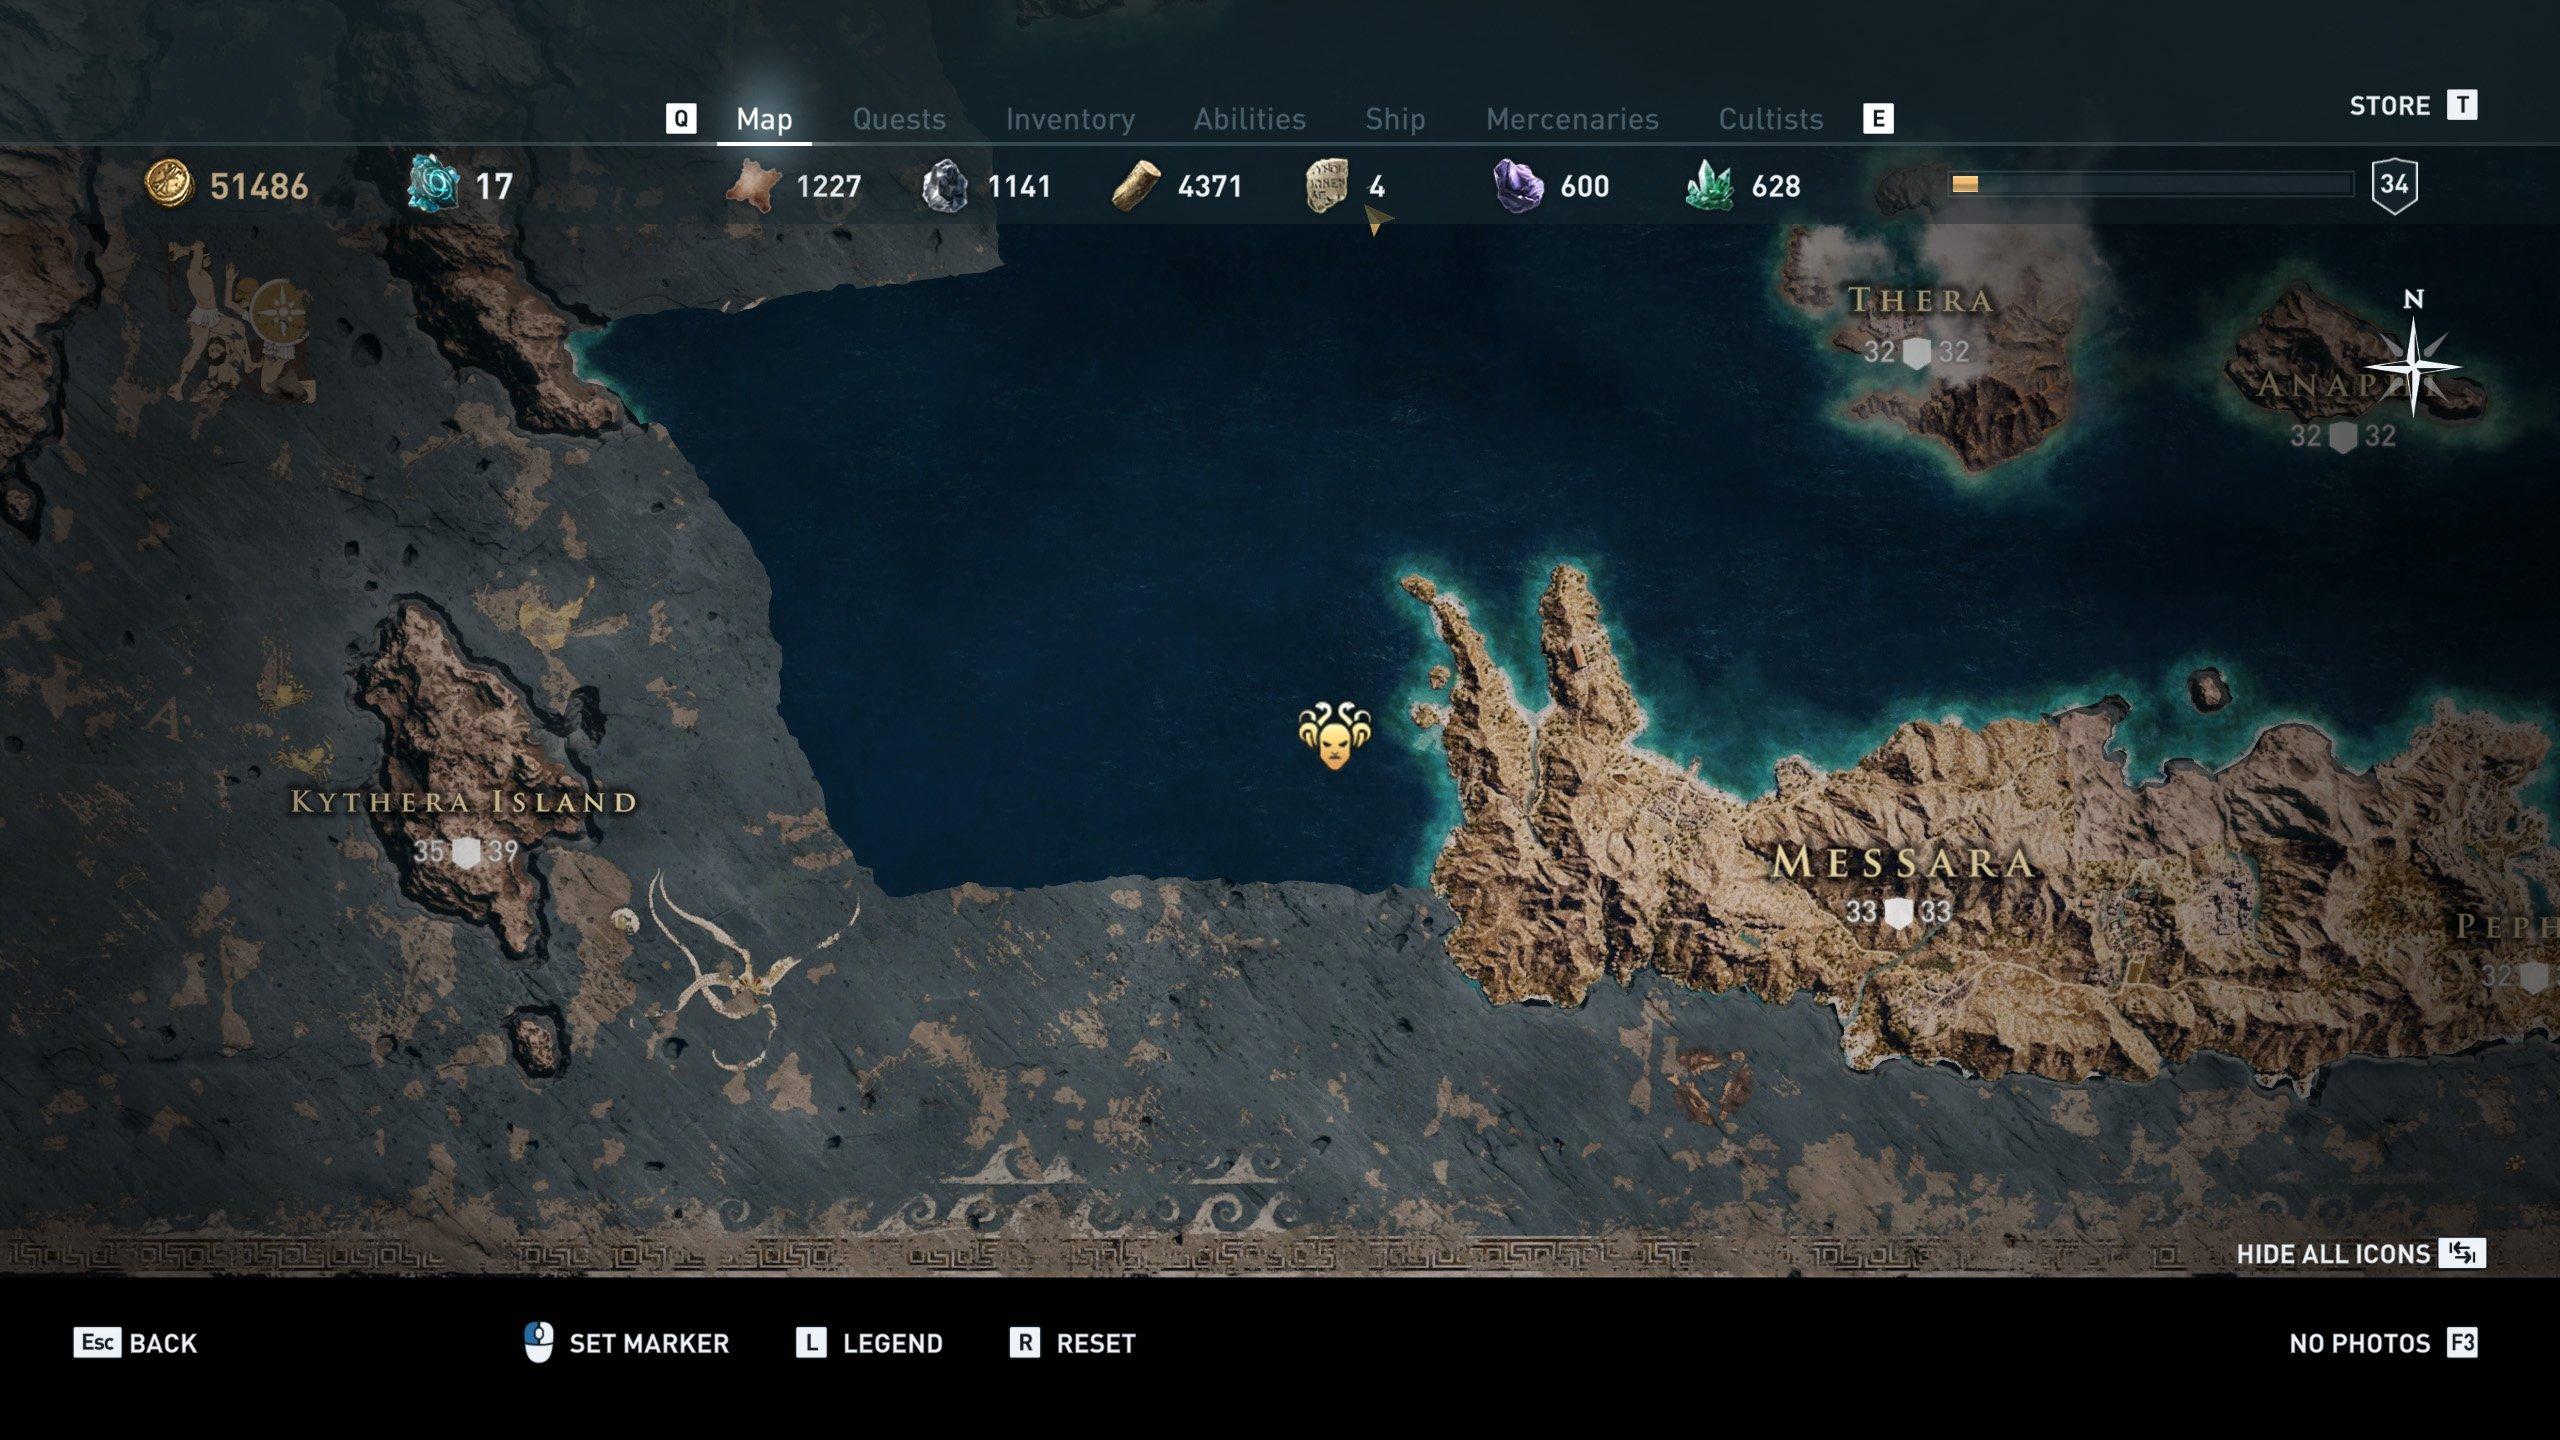 Gods of the Aegean Sea cultists - Melanthos location